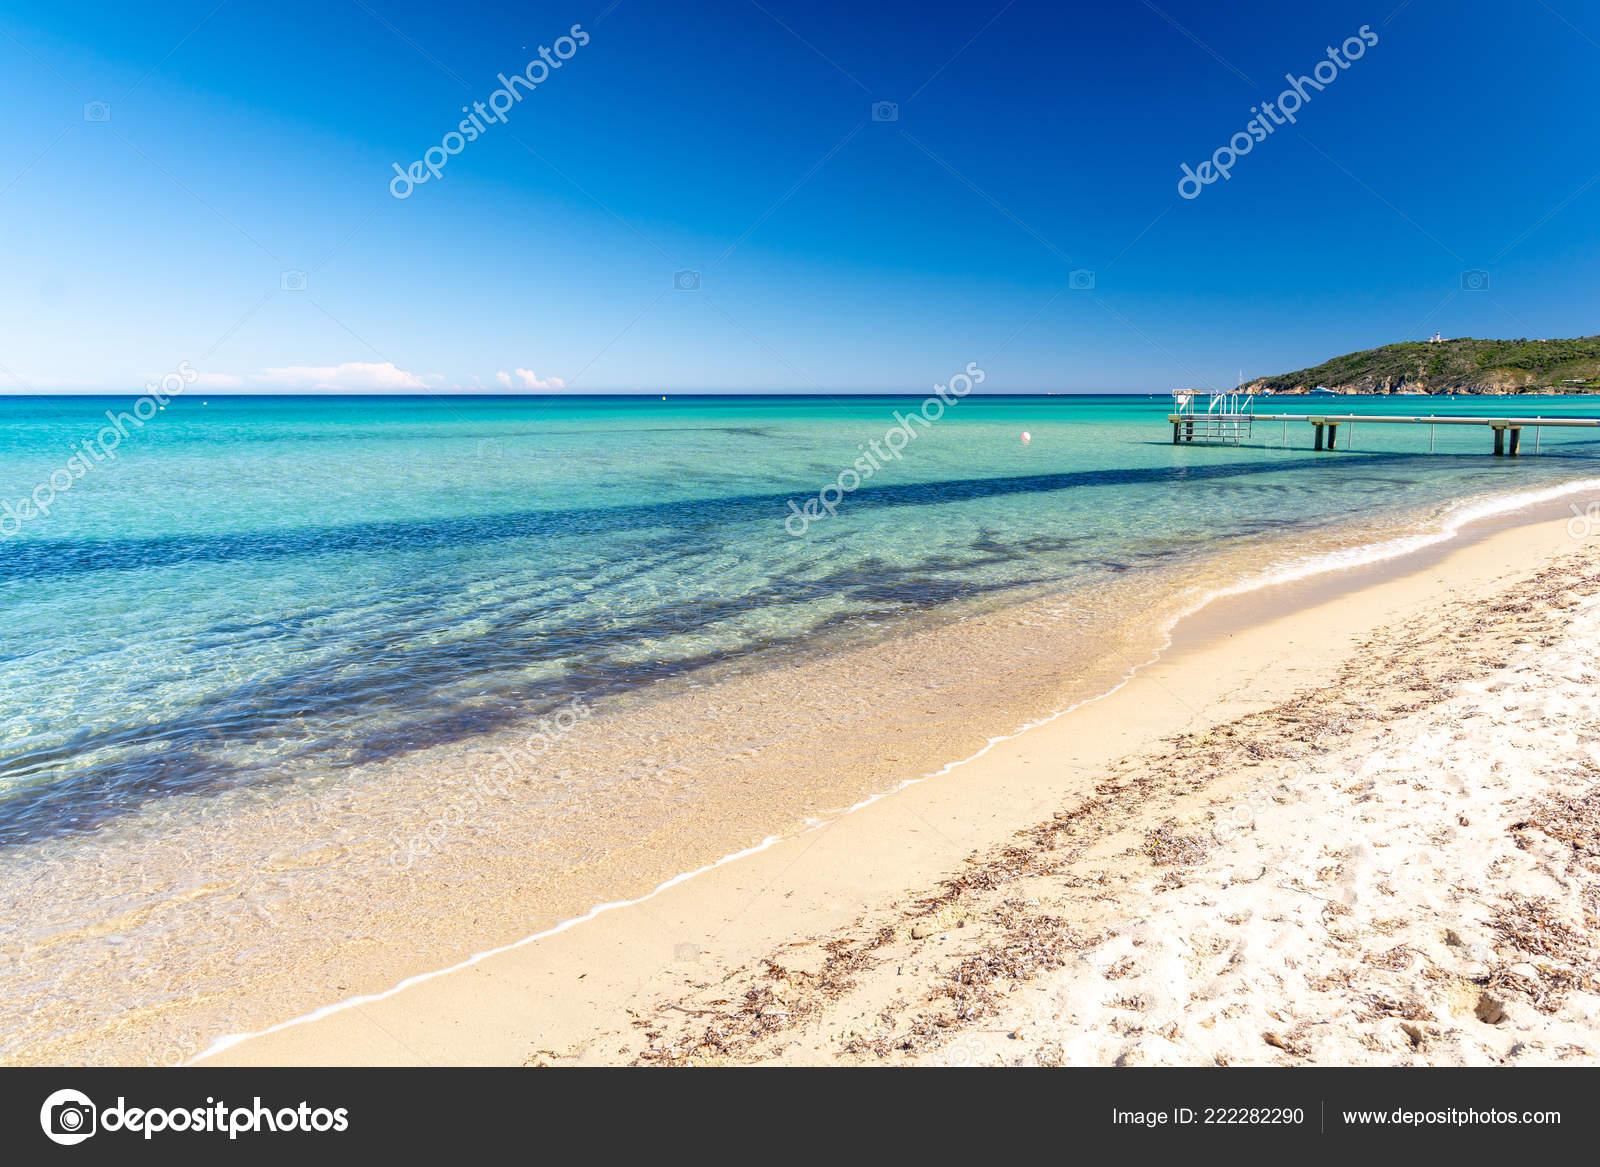 Beautiful View Pampelonne Beach Saint Tropez French Riviera France